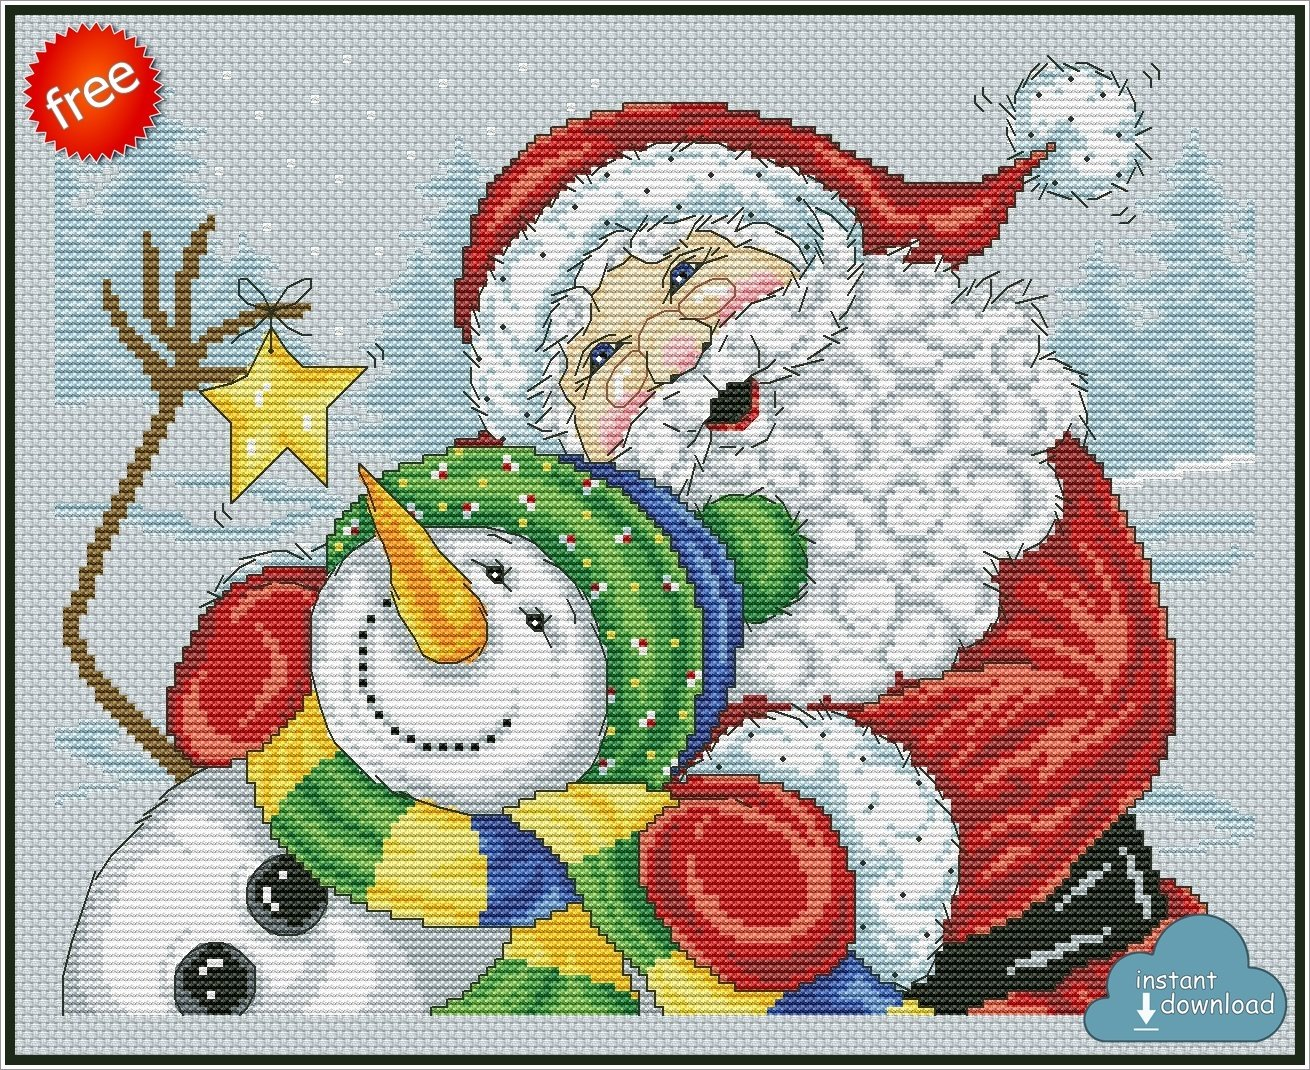 Merry Christmas Santa Snowman Cross Stitch Pattern PDF. Instant Download. Free